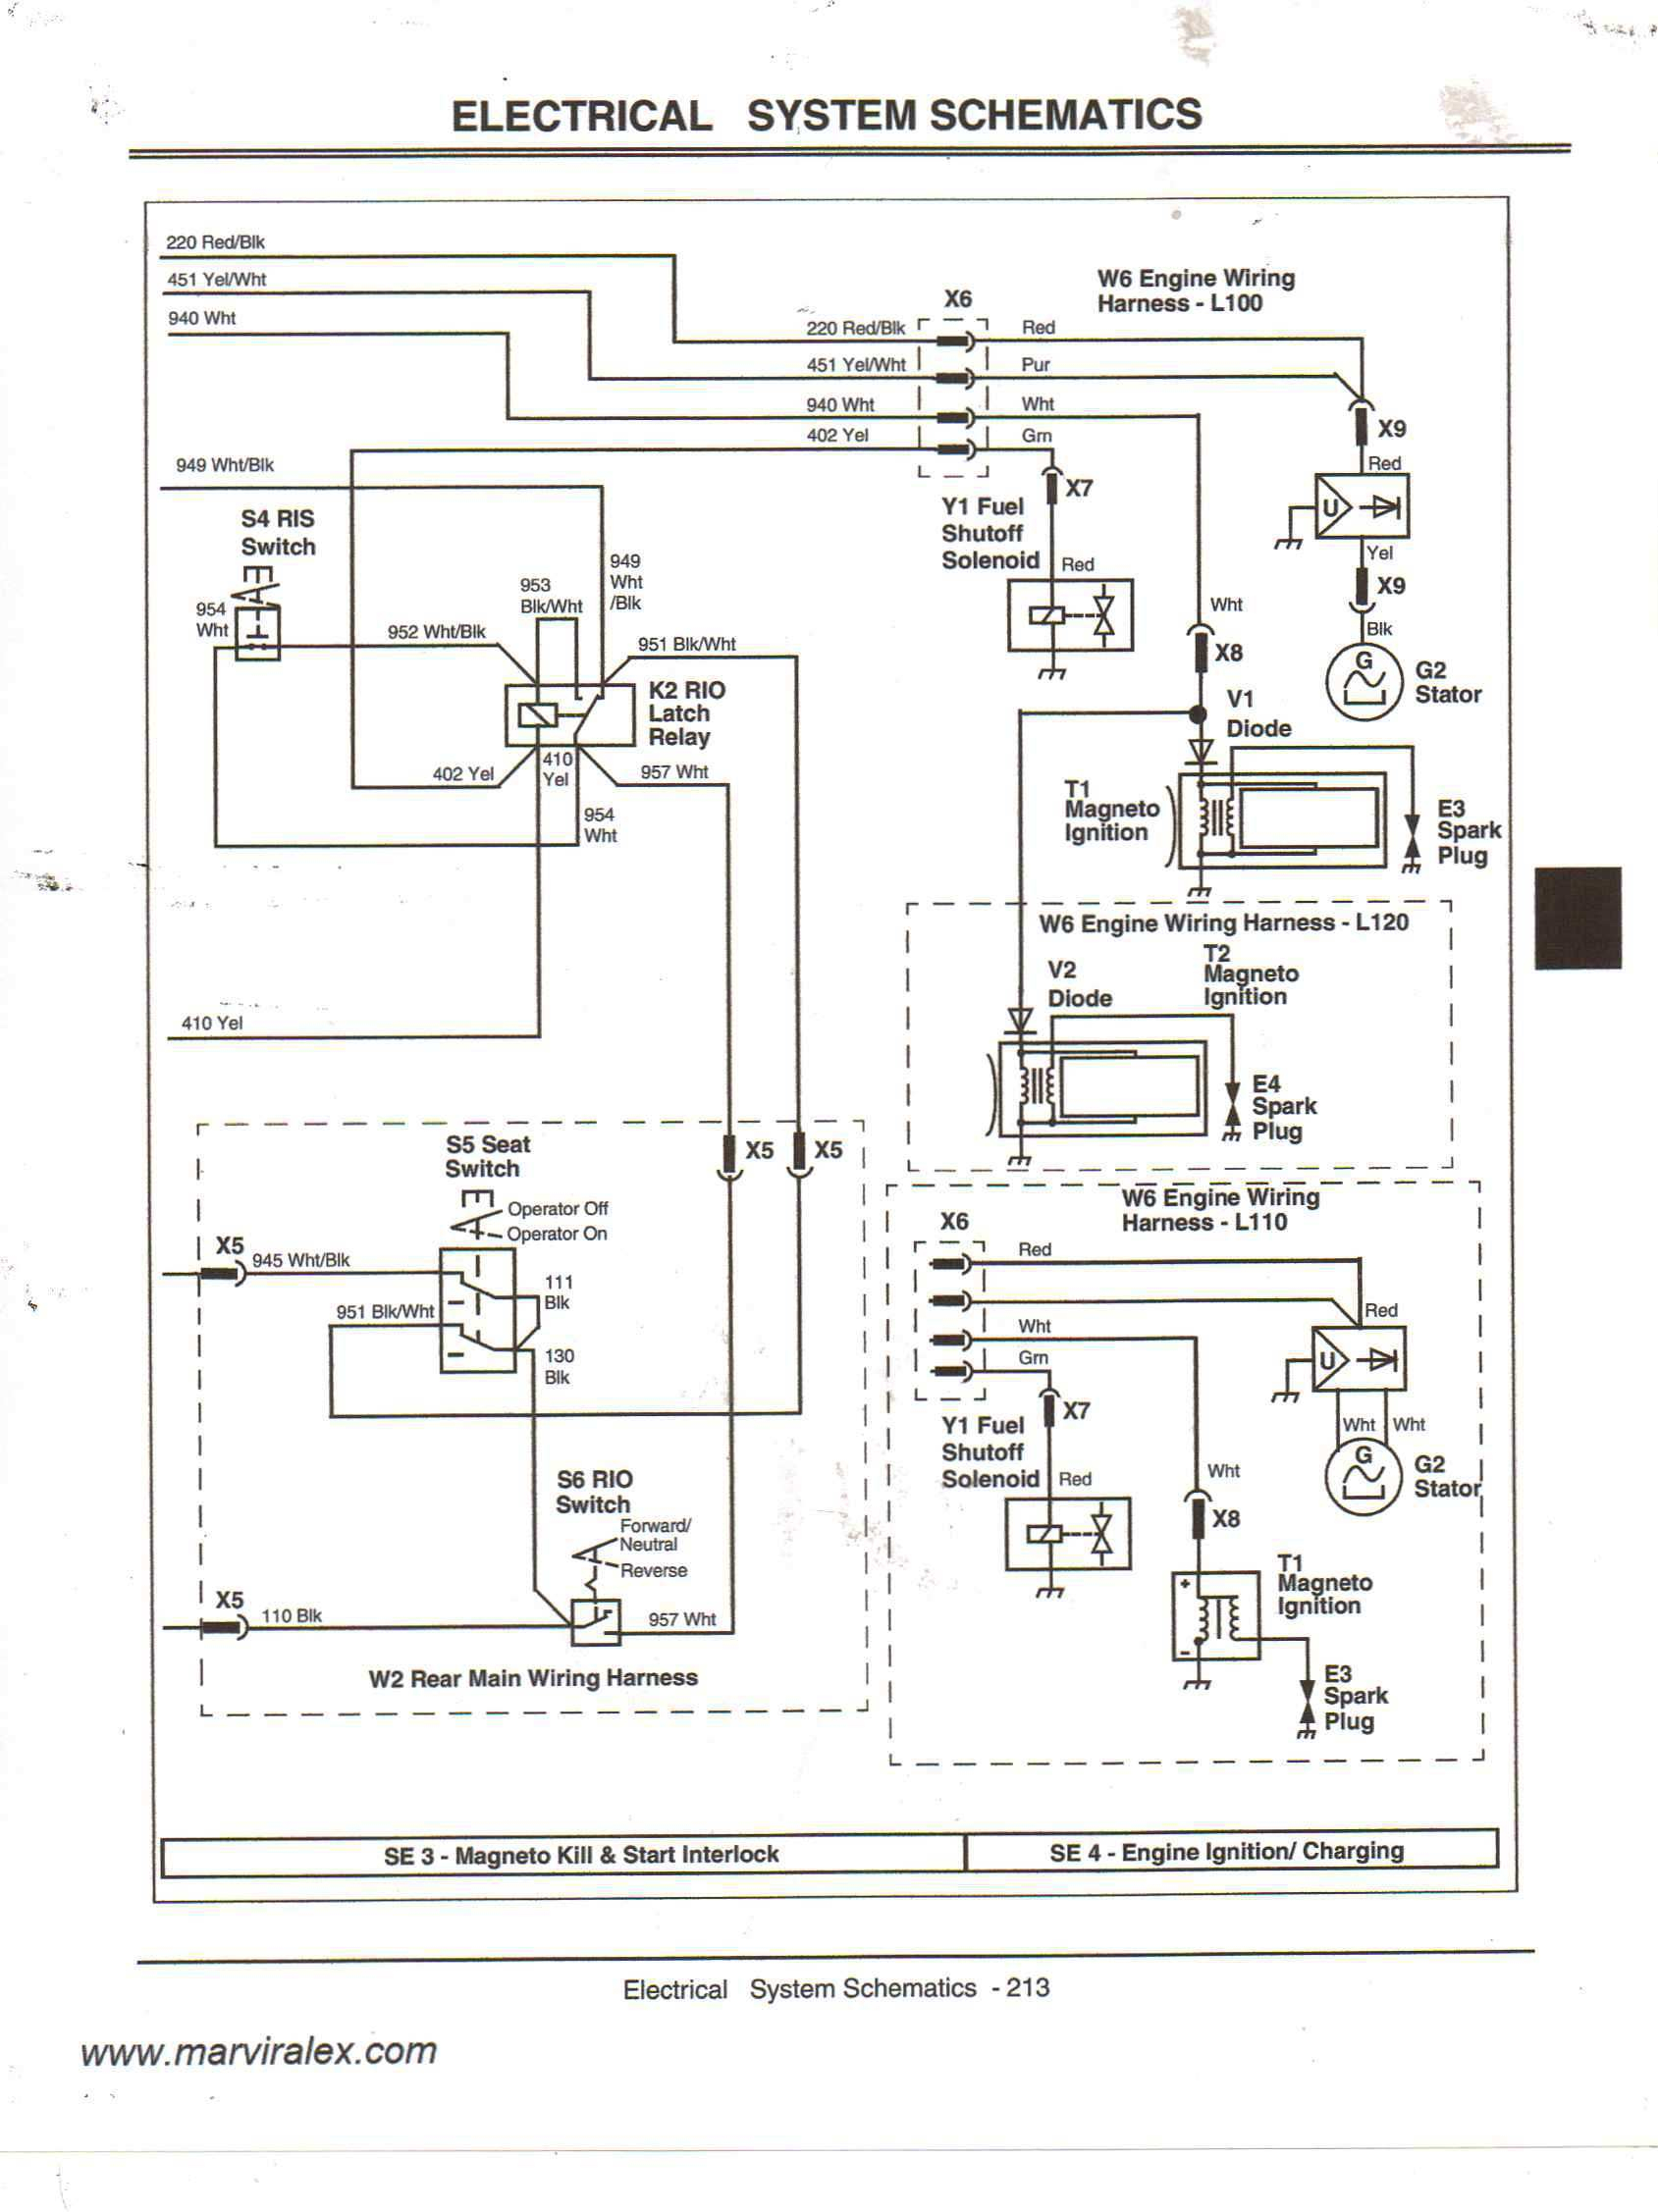 John Deere 6310 Wiring Diagram   Manual E-Books - John Deere Wiring Diagram